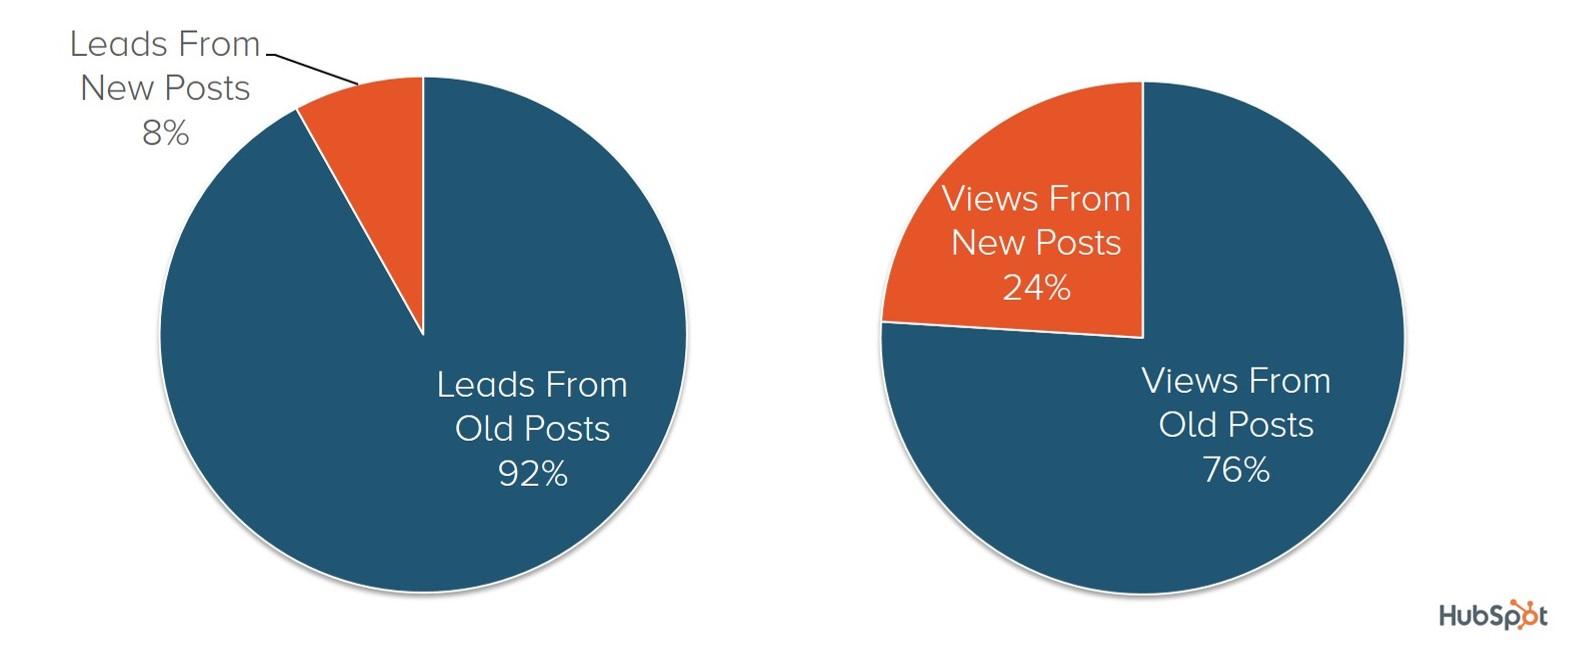 hubspot-old-new-blog-distribution.jpg